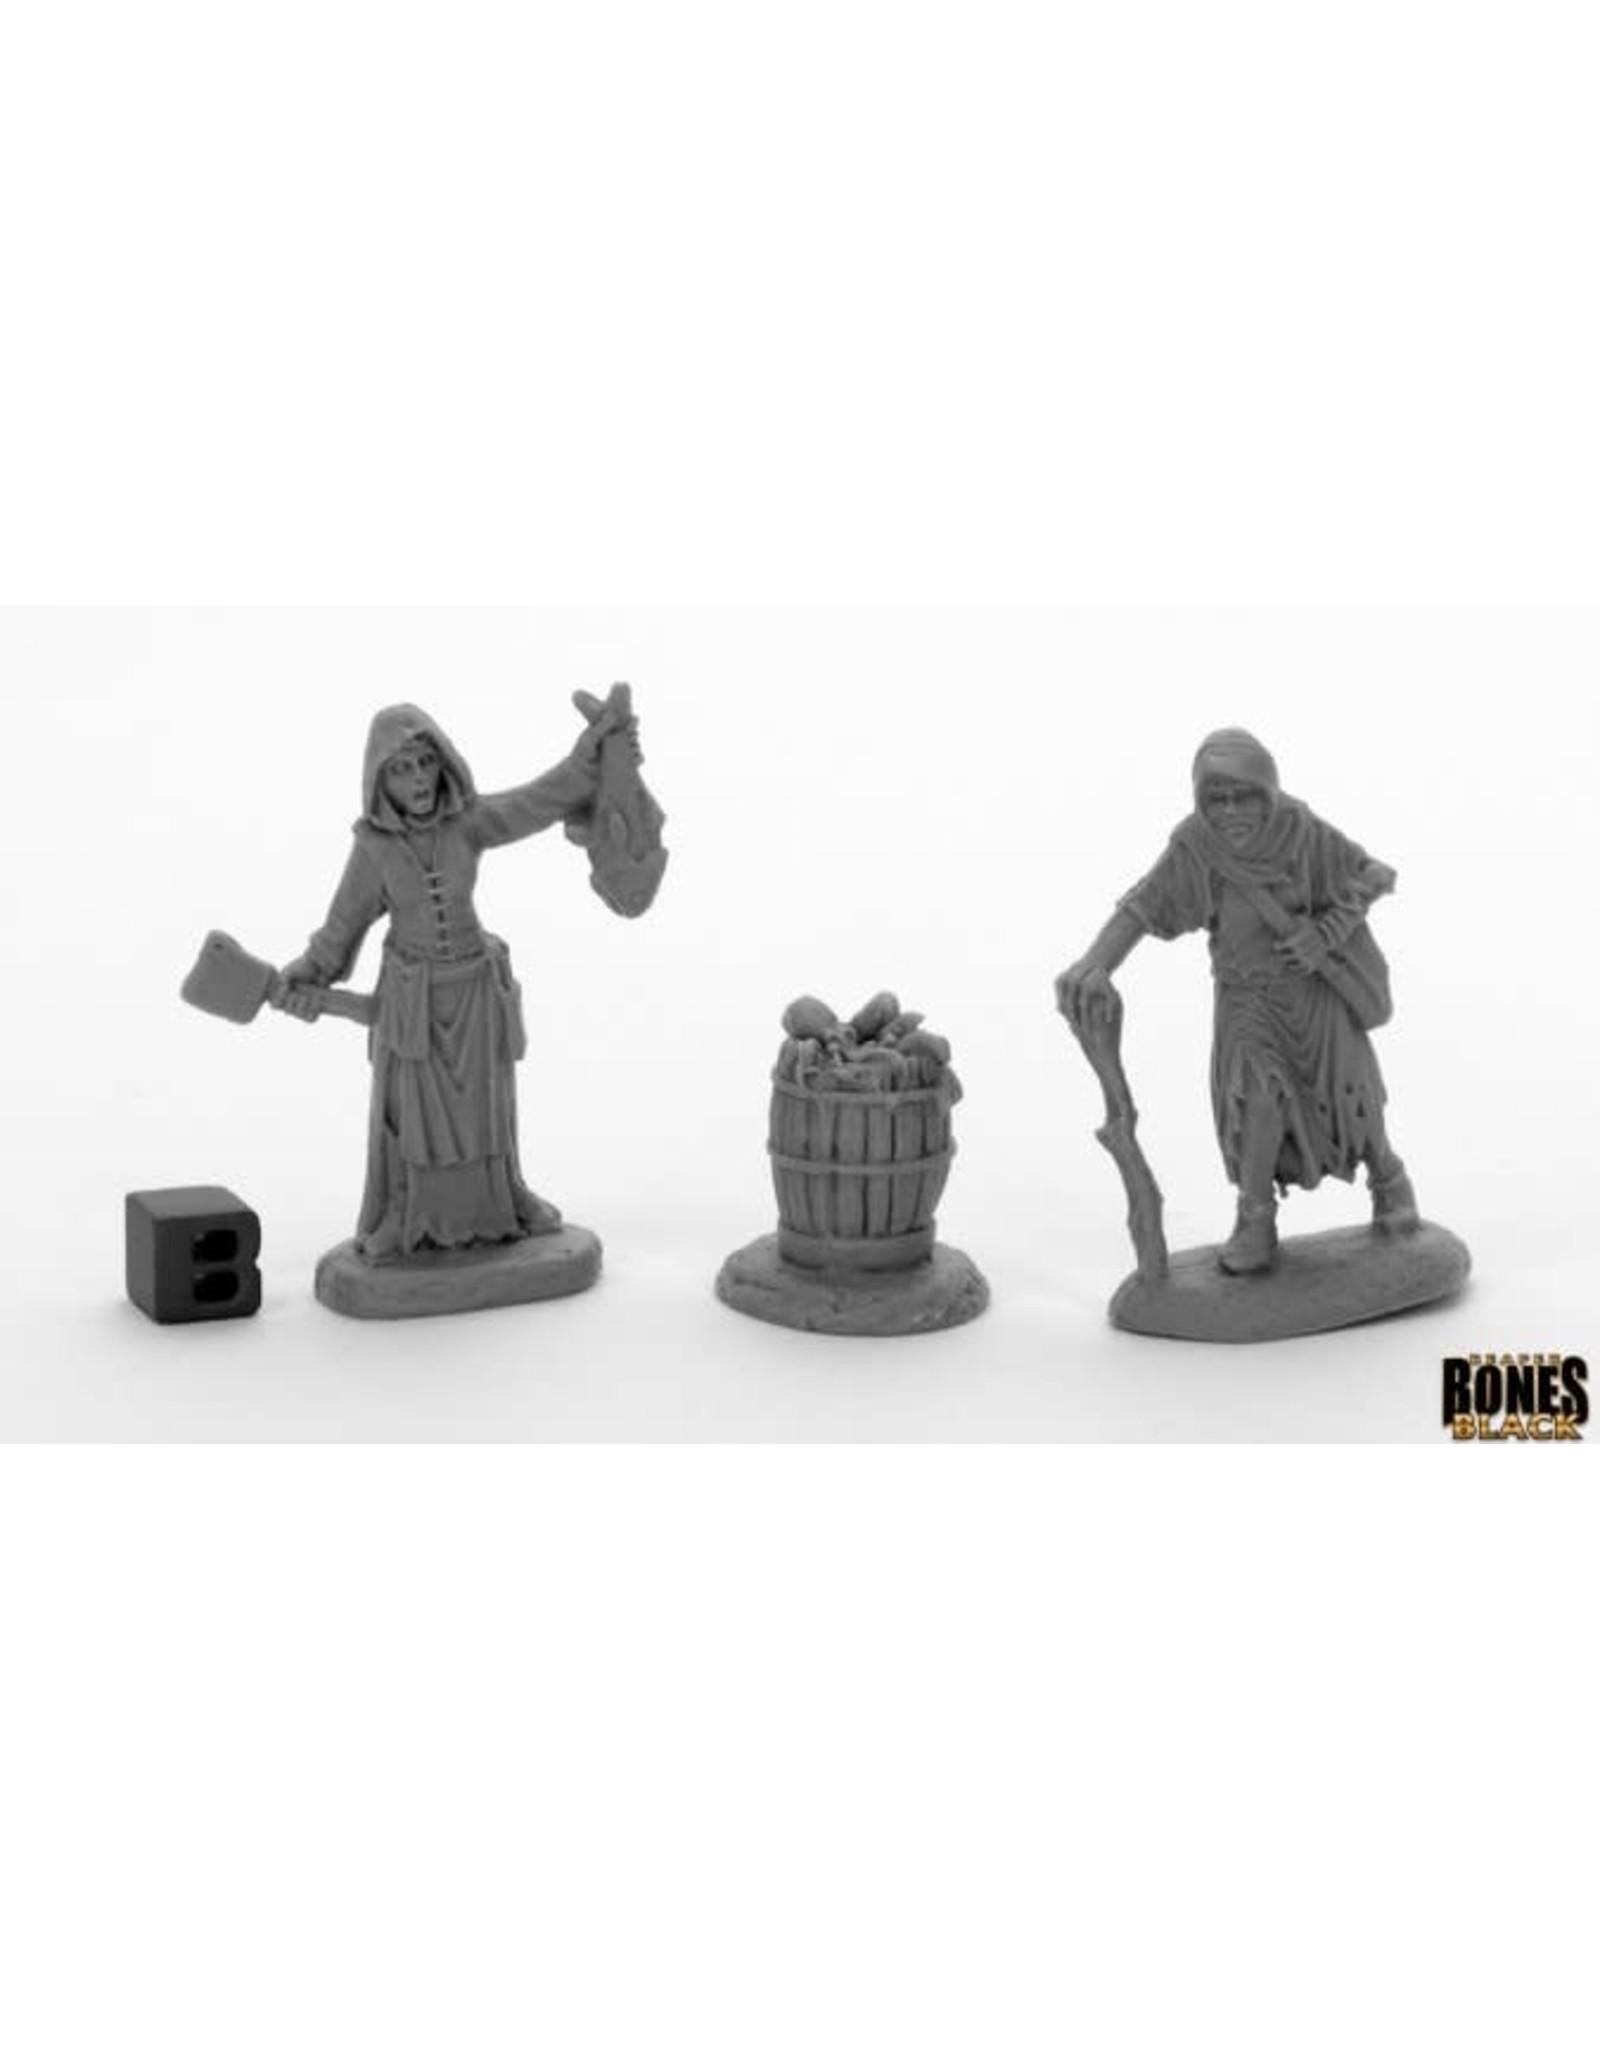 Reaper Miniatures Bones Black: Townsfolk Fishwife & Crone